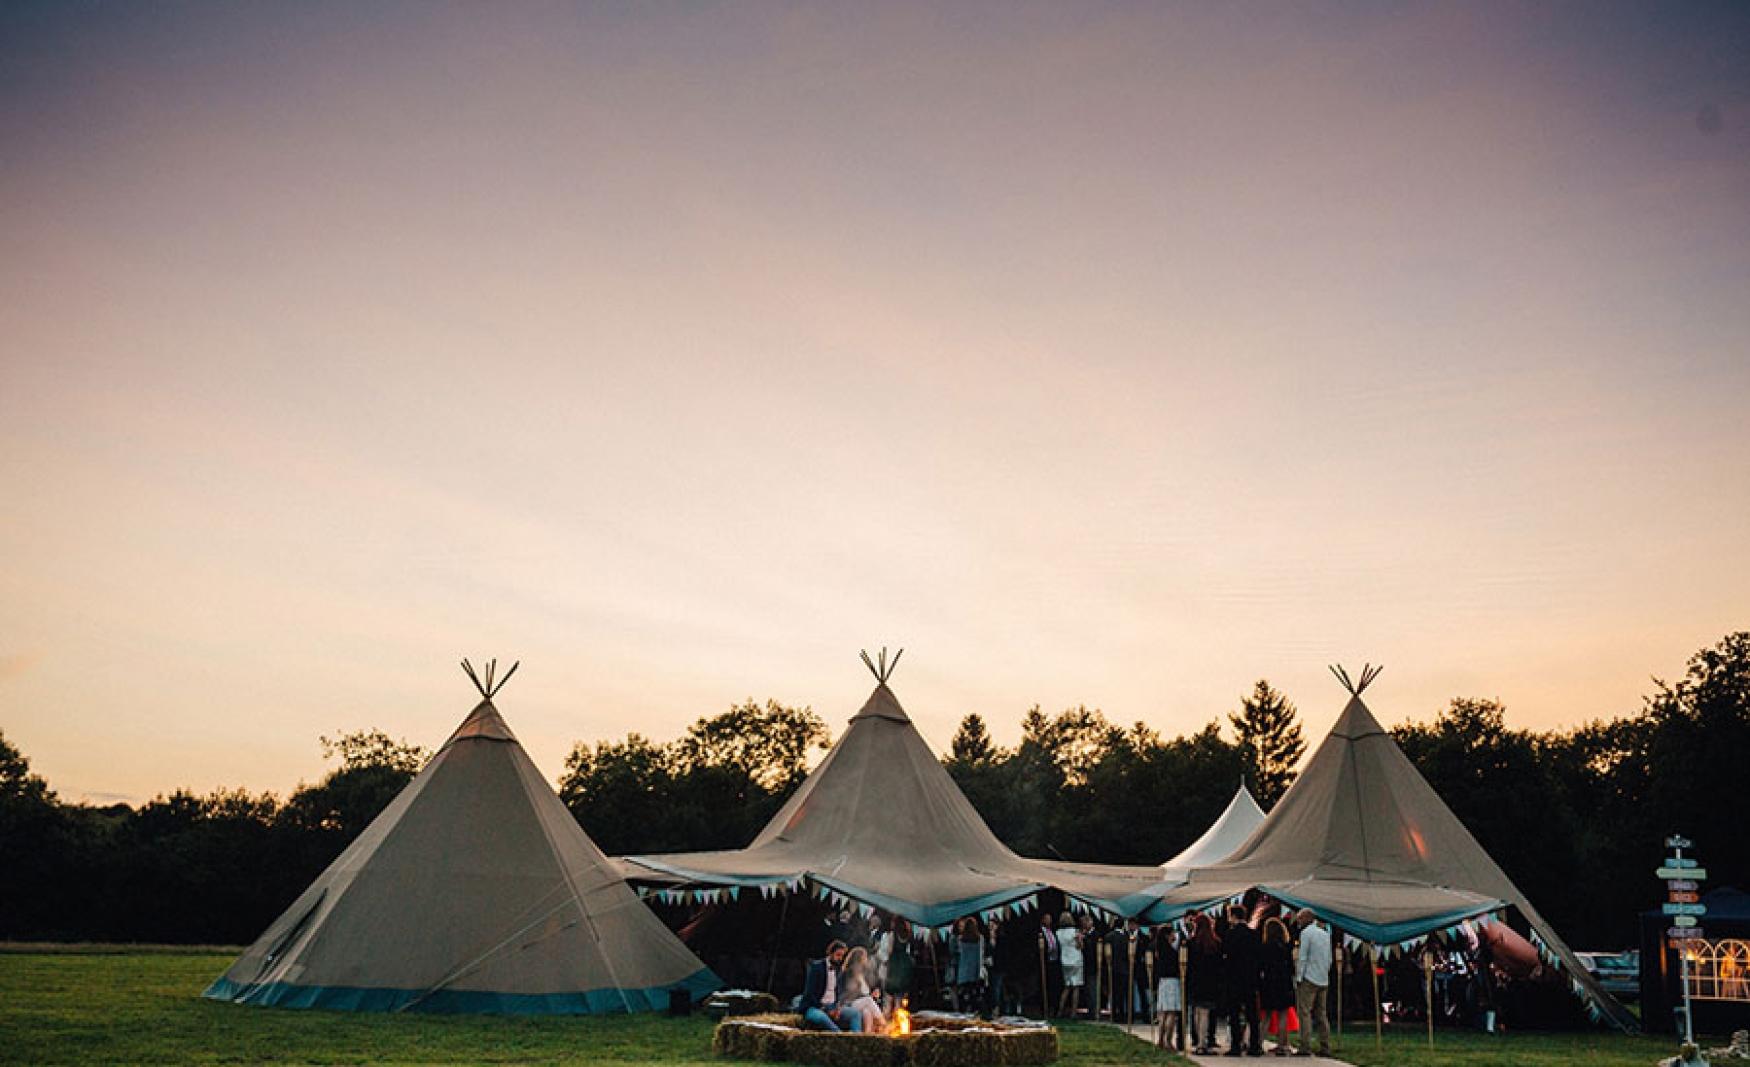 fiesta-fields-outdoor-wedding-events-company-tipi-surrey-sussex-phoenice-fields-leatherhead-4